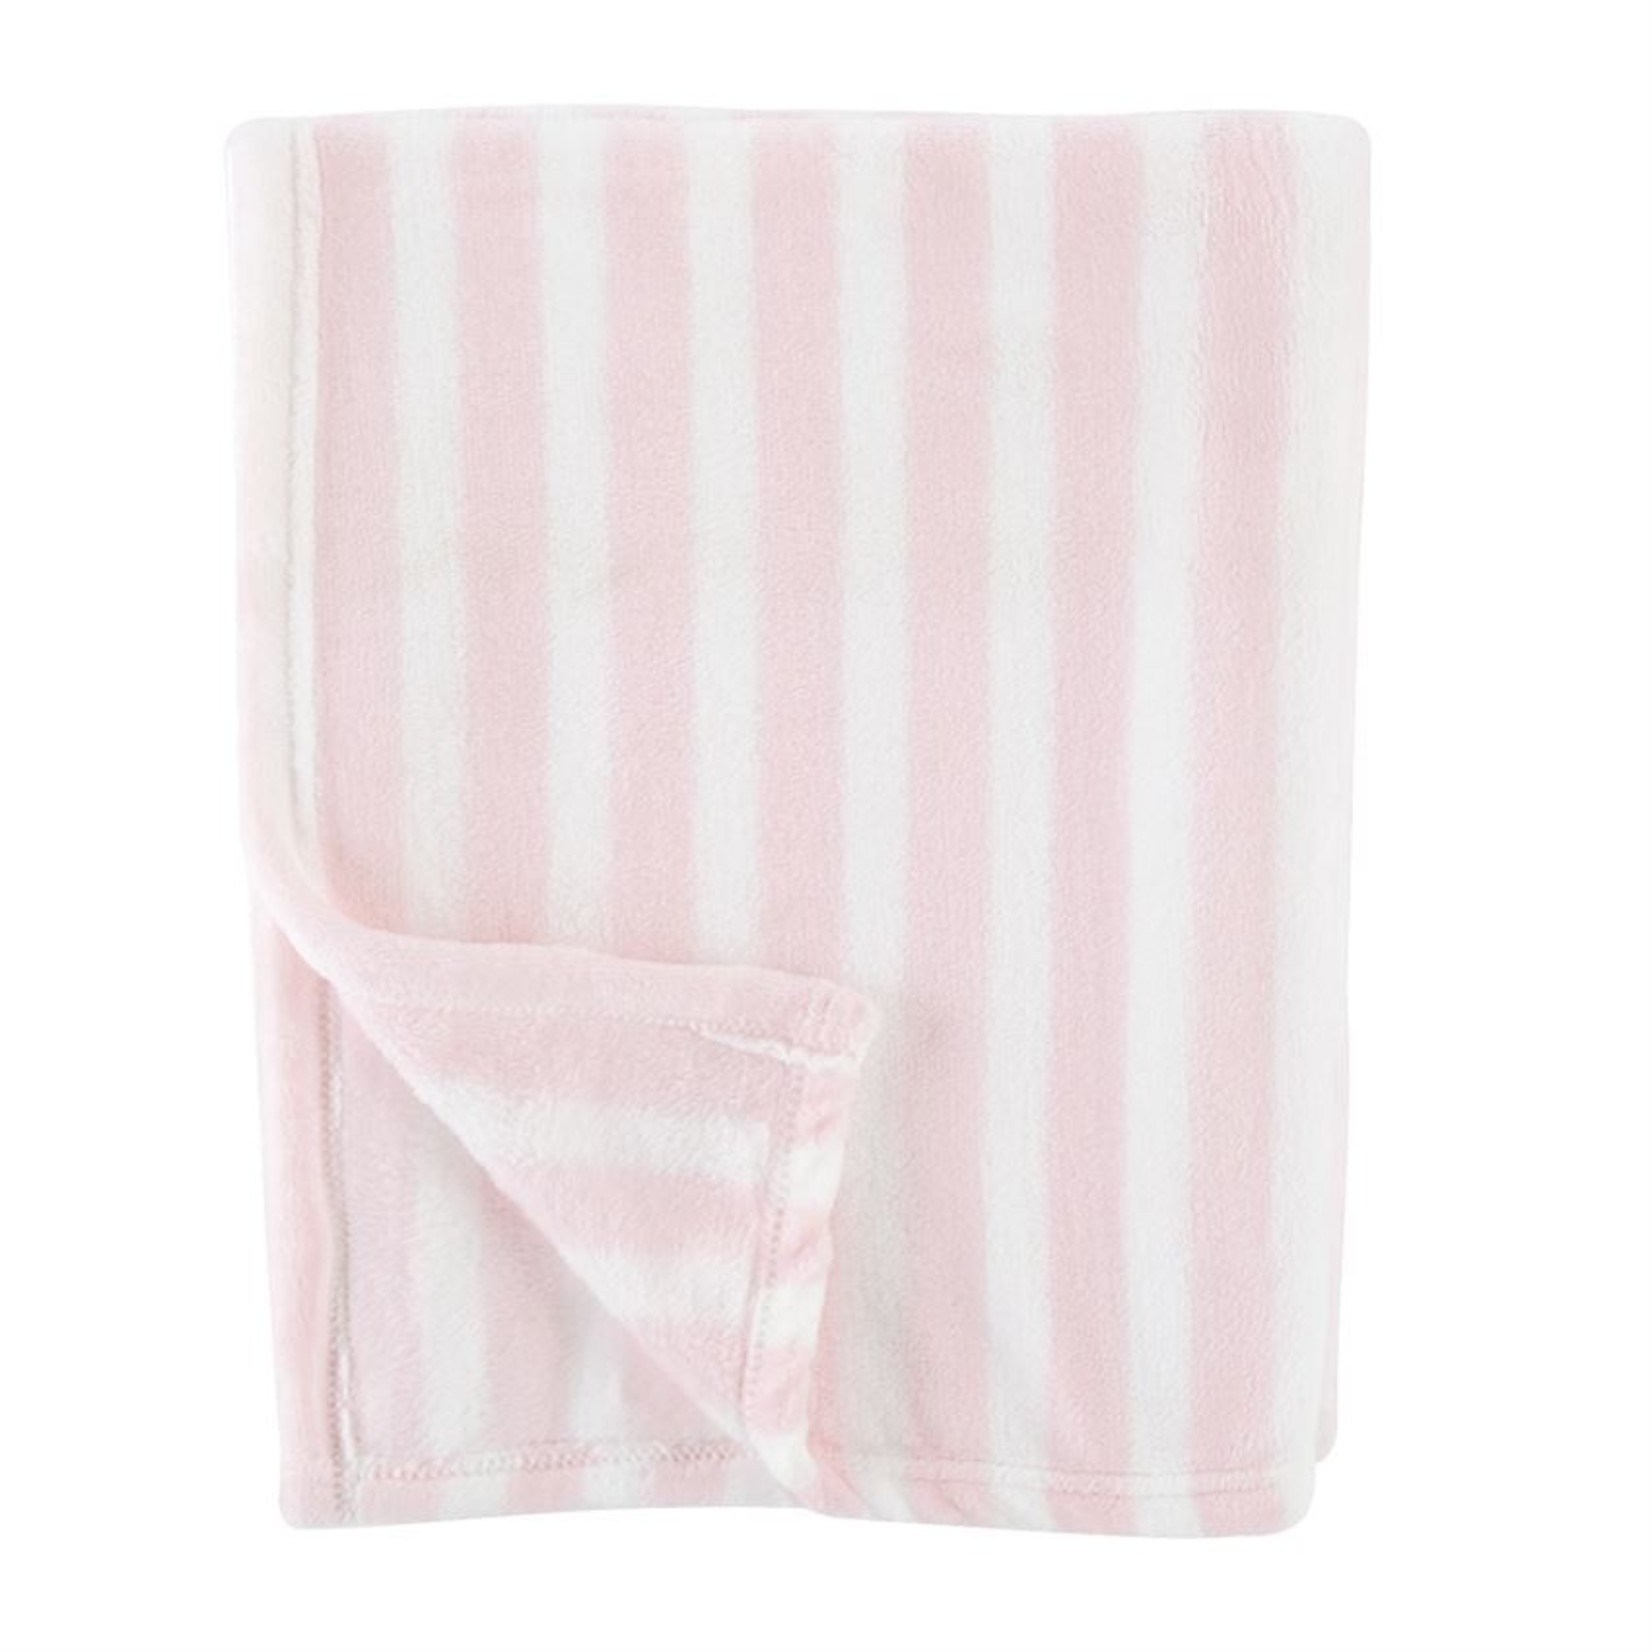 Mudpie Plush Animal with Blanket